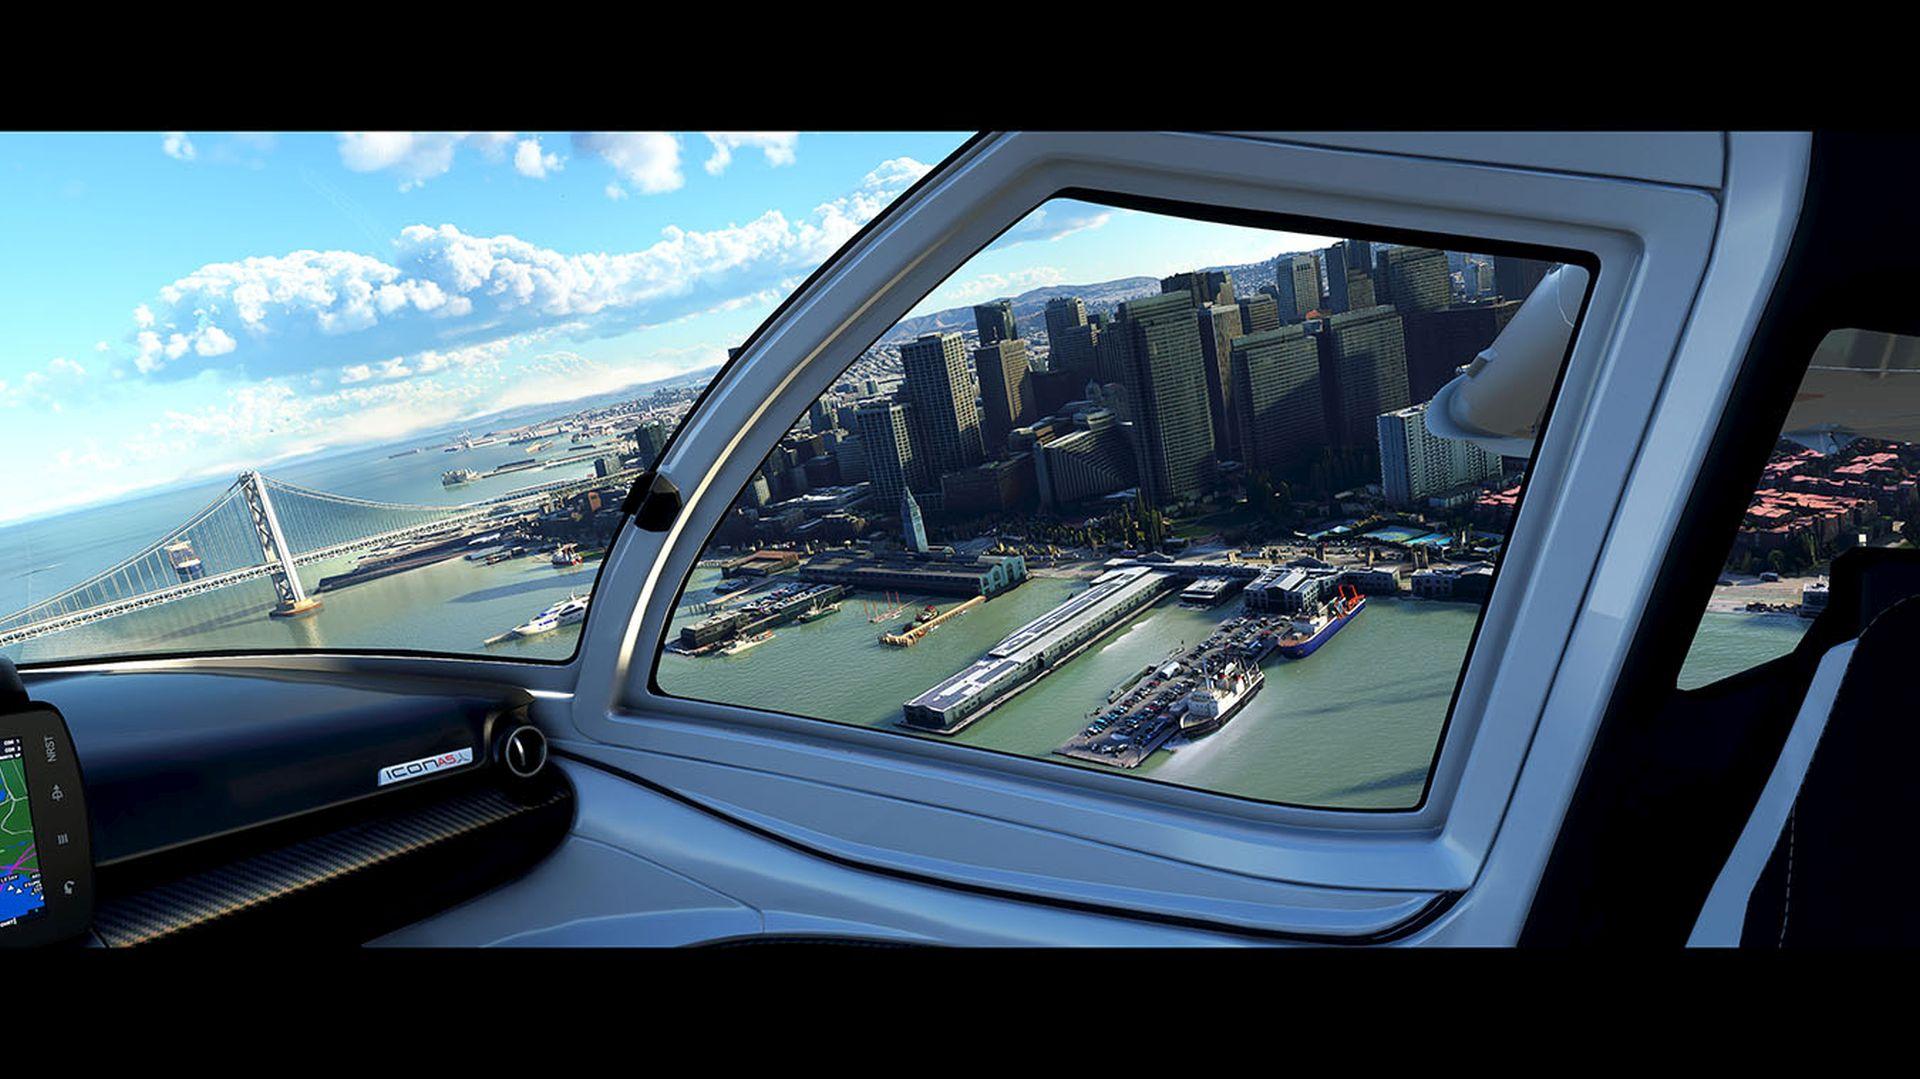 Microsoft's Flight Simulator